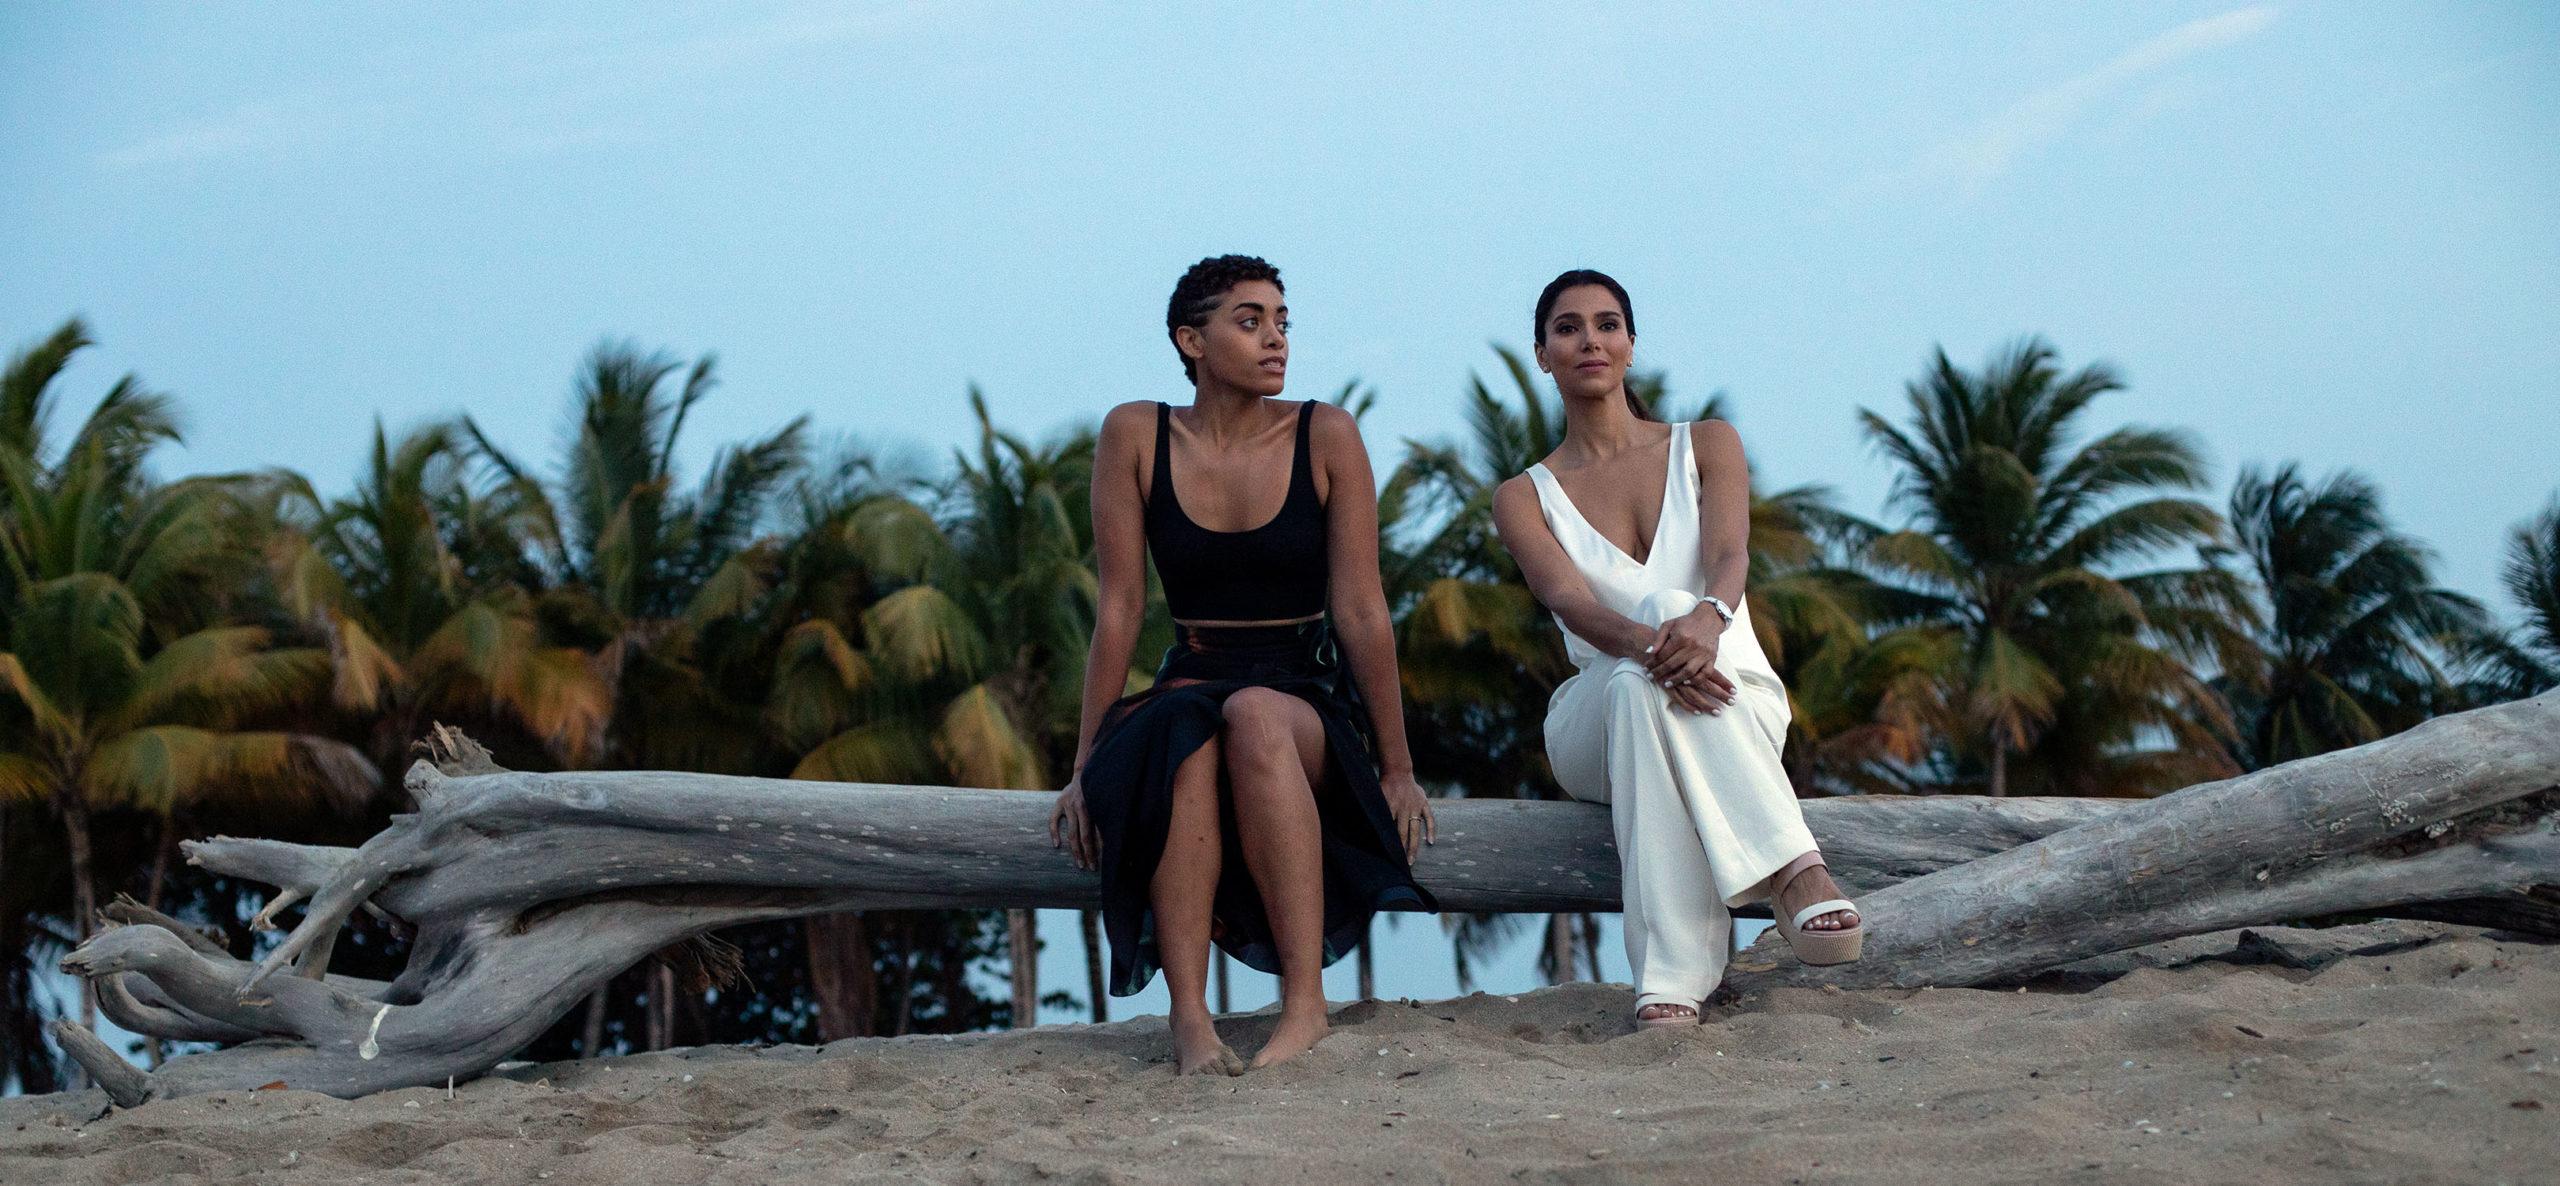 Fantasy Island - Kiara Barnes + Roselyn Sánchez